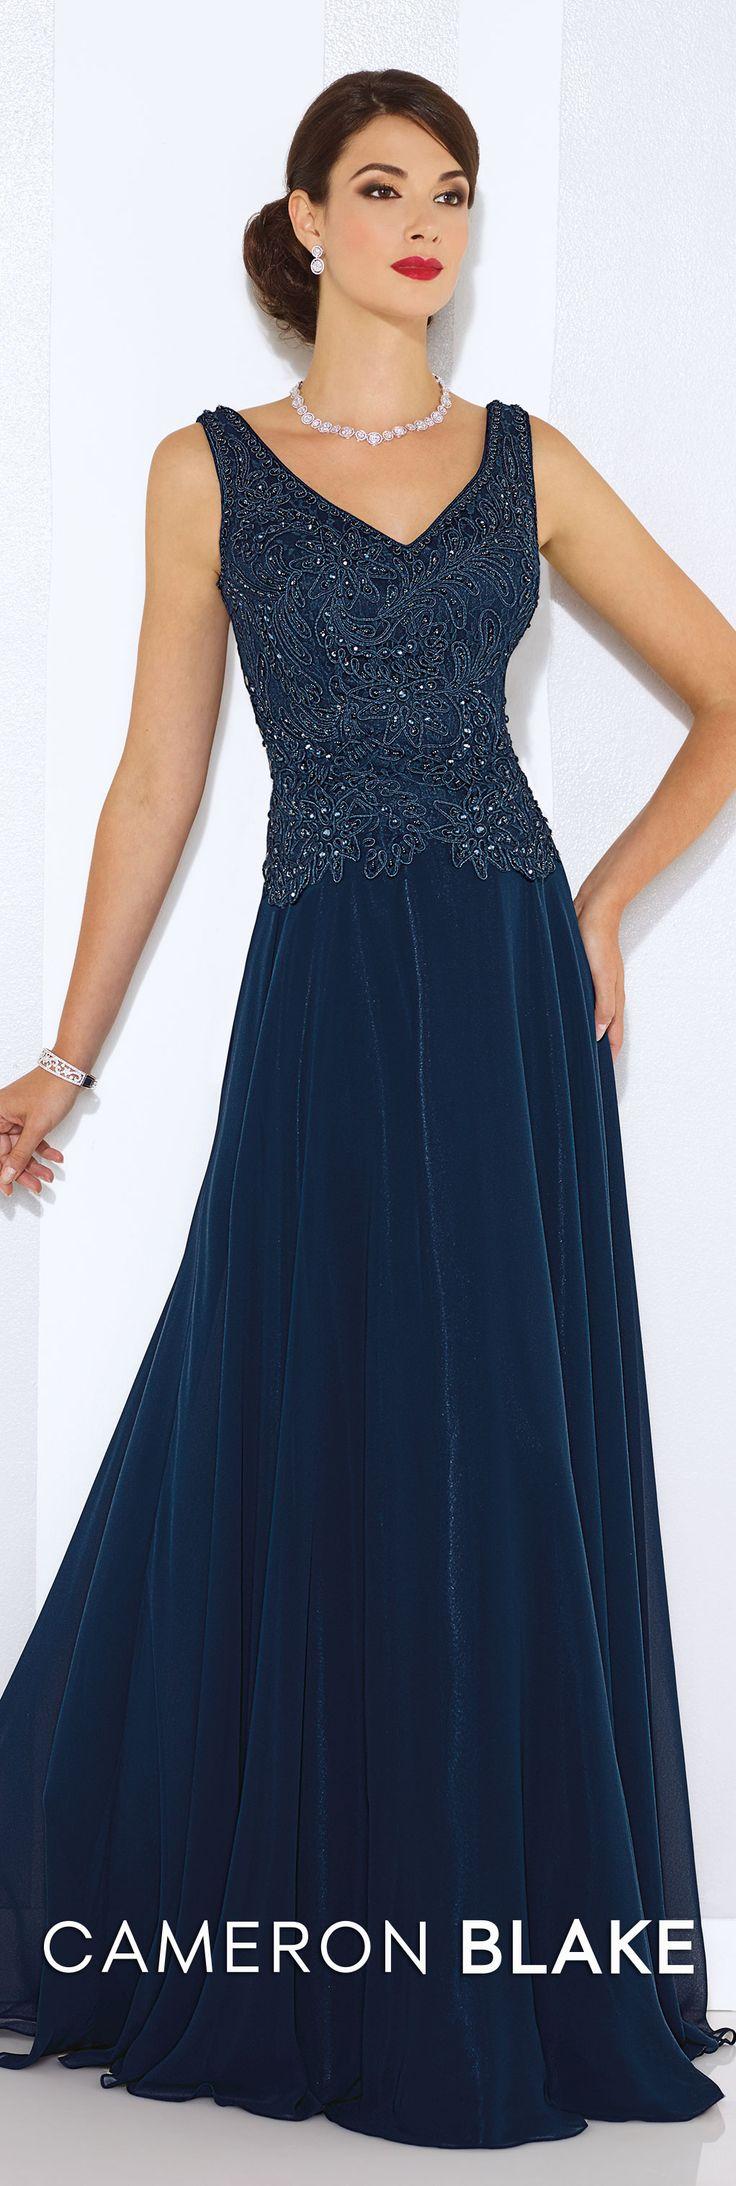 Cameron Blake Spring 2016 - Style No. 116654 #formaleveningdresses